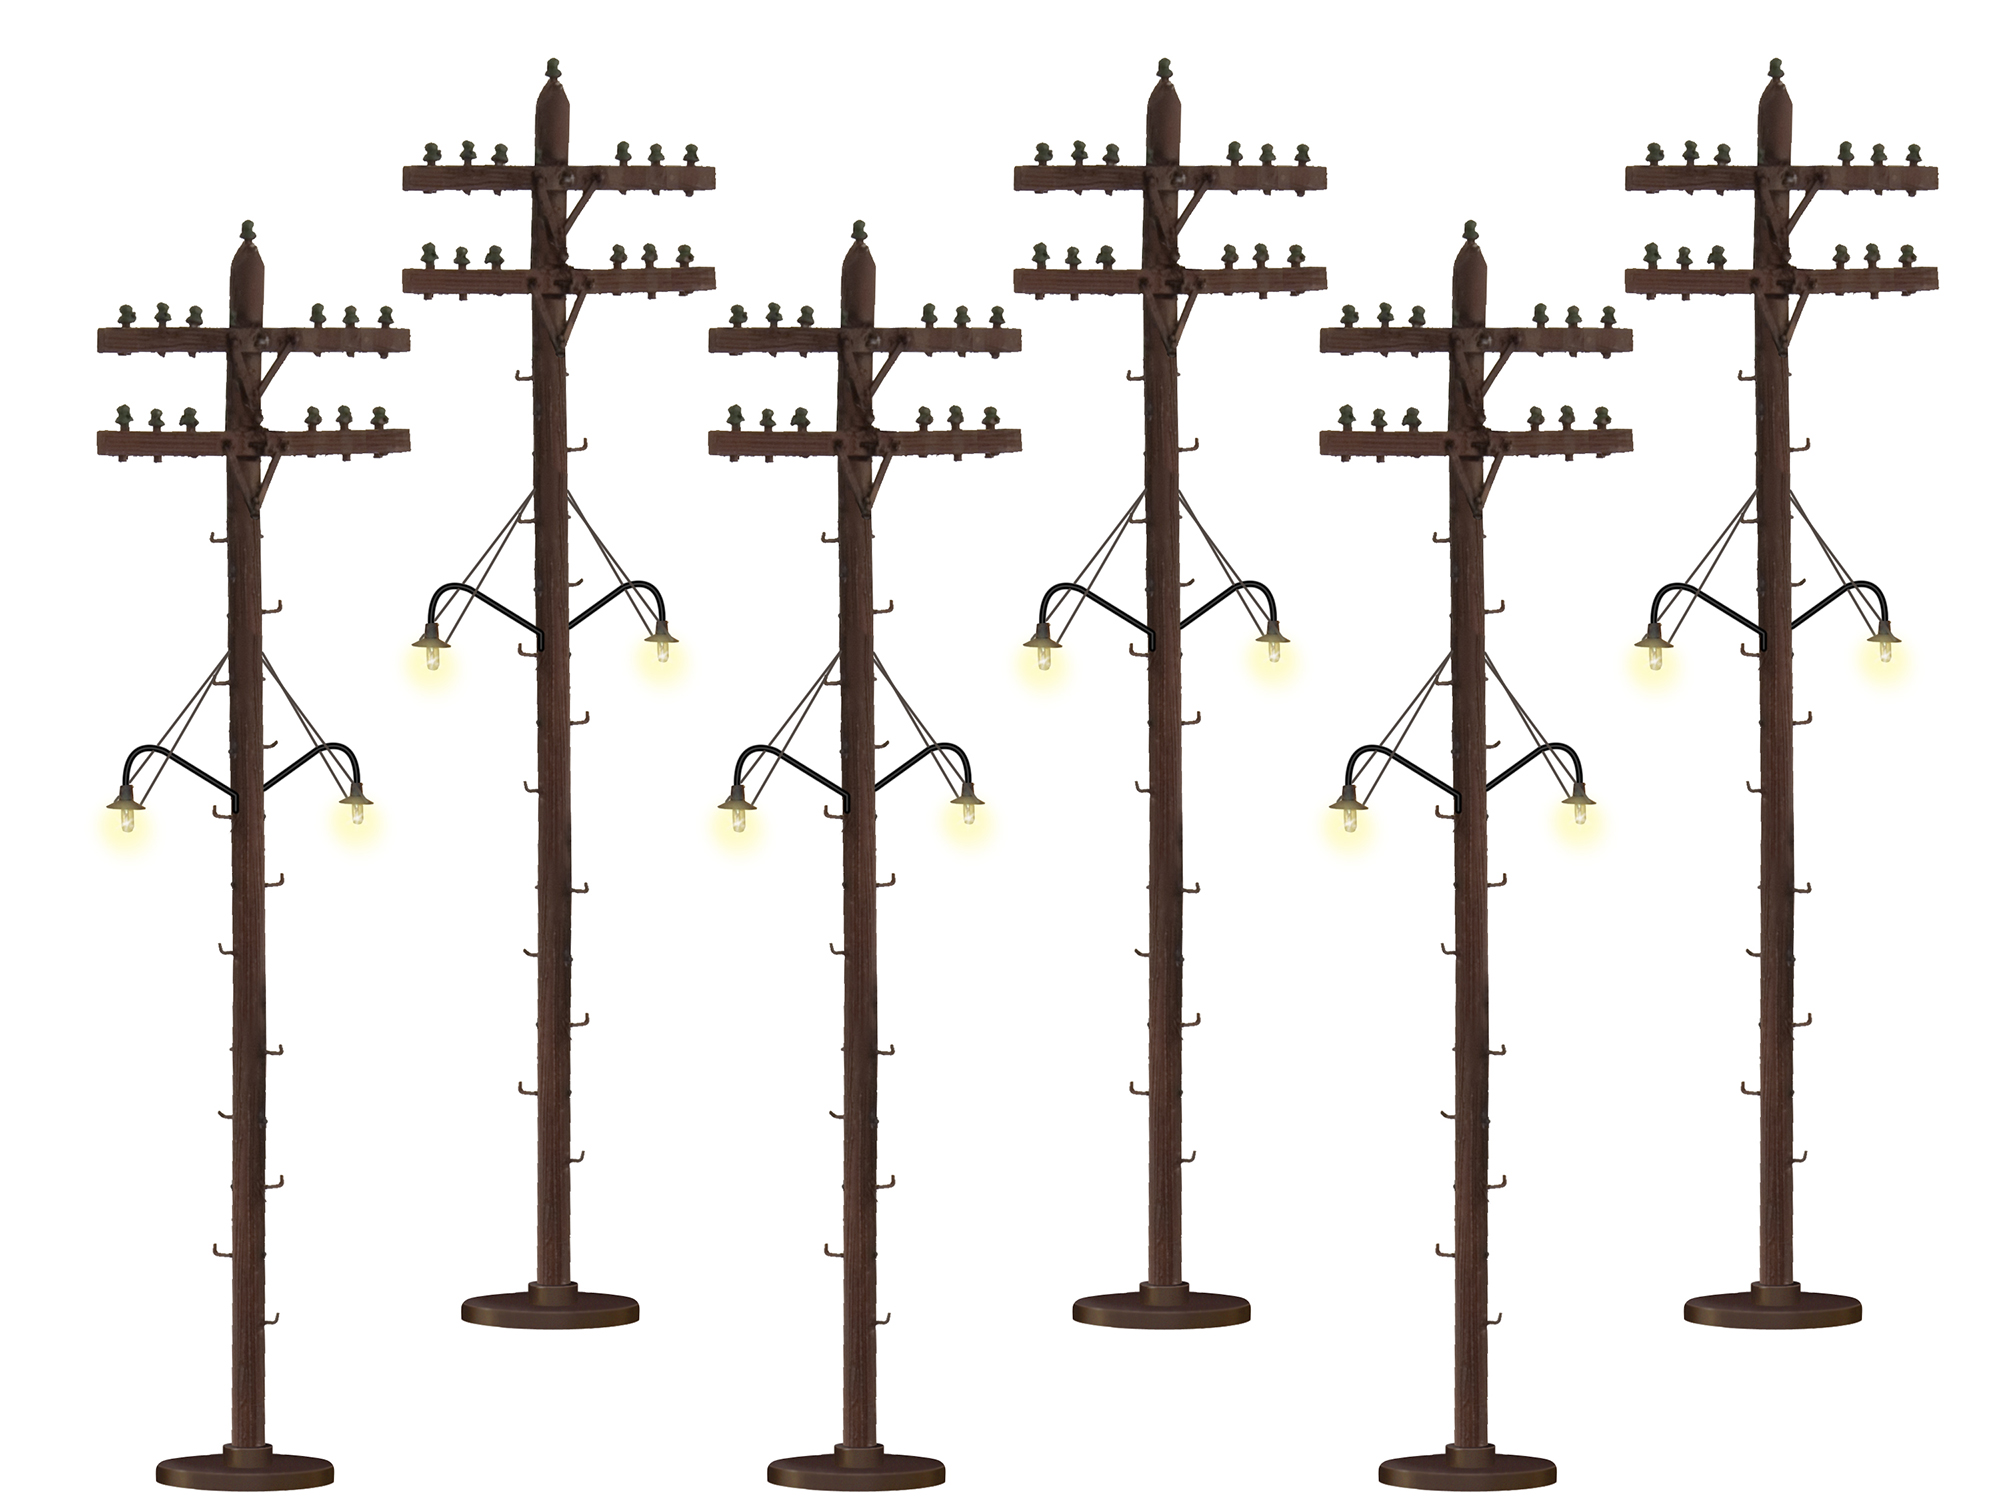 Lionel 637995 O Telephone Pole Lighted 6/ 434-637995